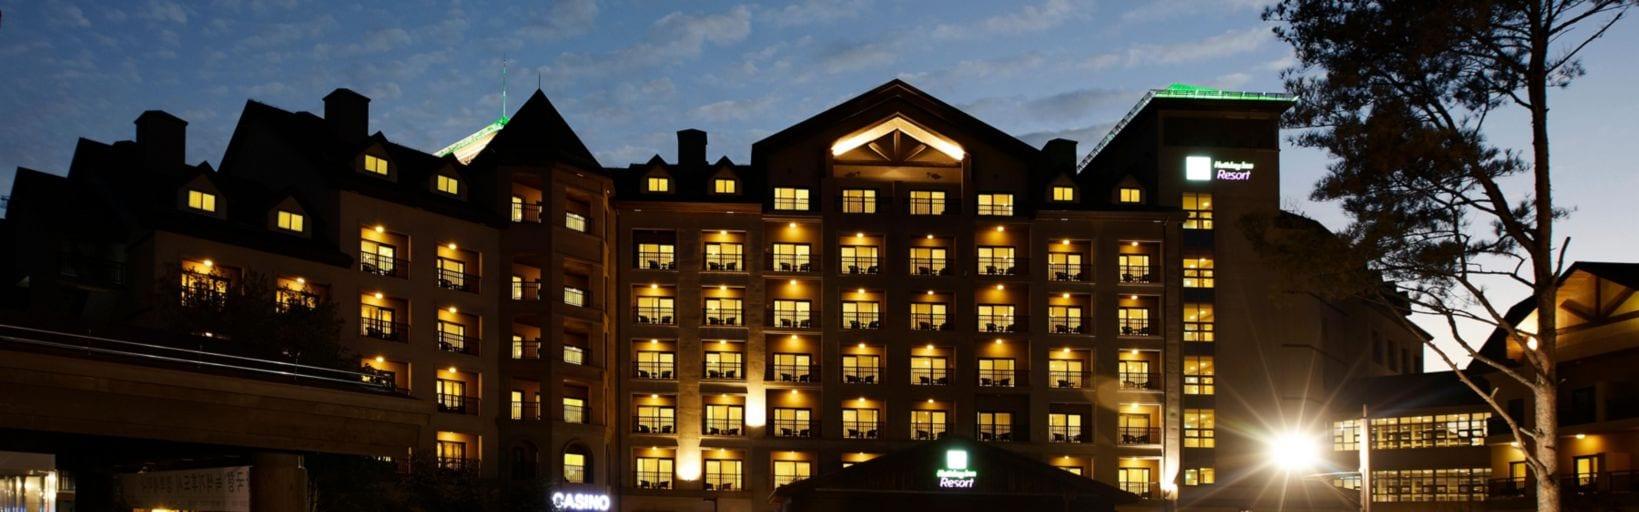 Holiday Inn Resort Alpensia | Pyeongchang-gun, Gangwon-do